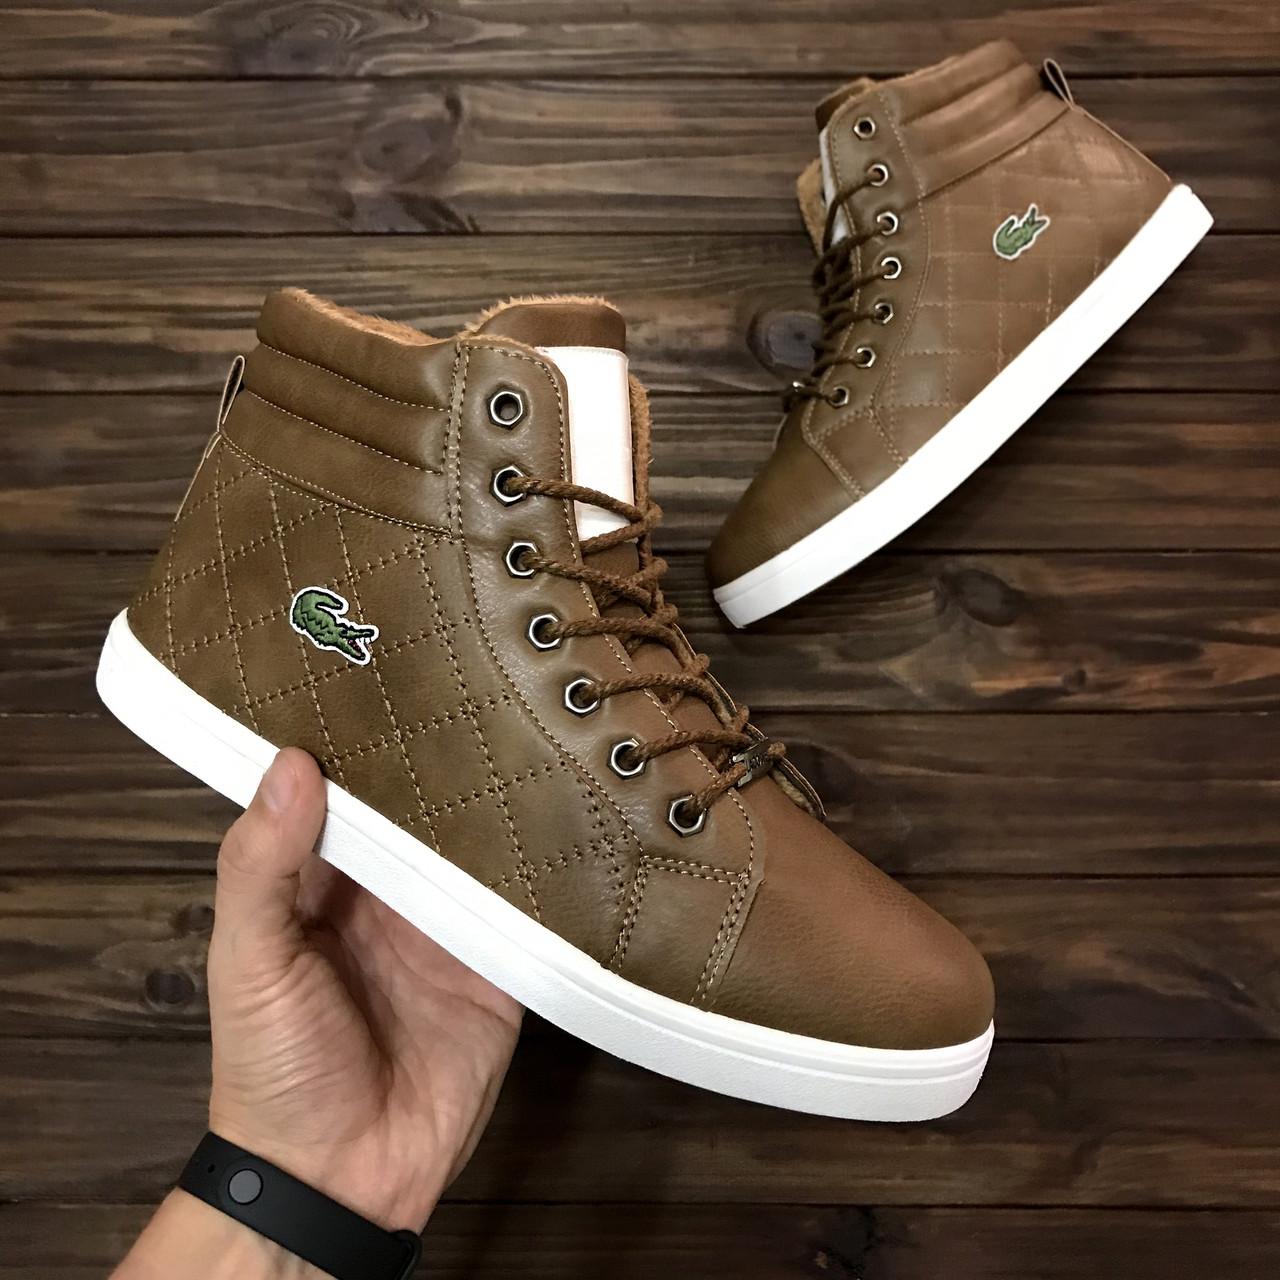 Зимние мужские ботинки Lacoste  920 грн. - Ботинки Желтые Воды ... 1212b72db5e